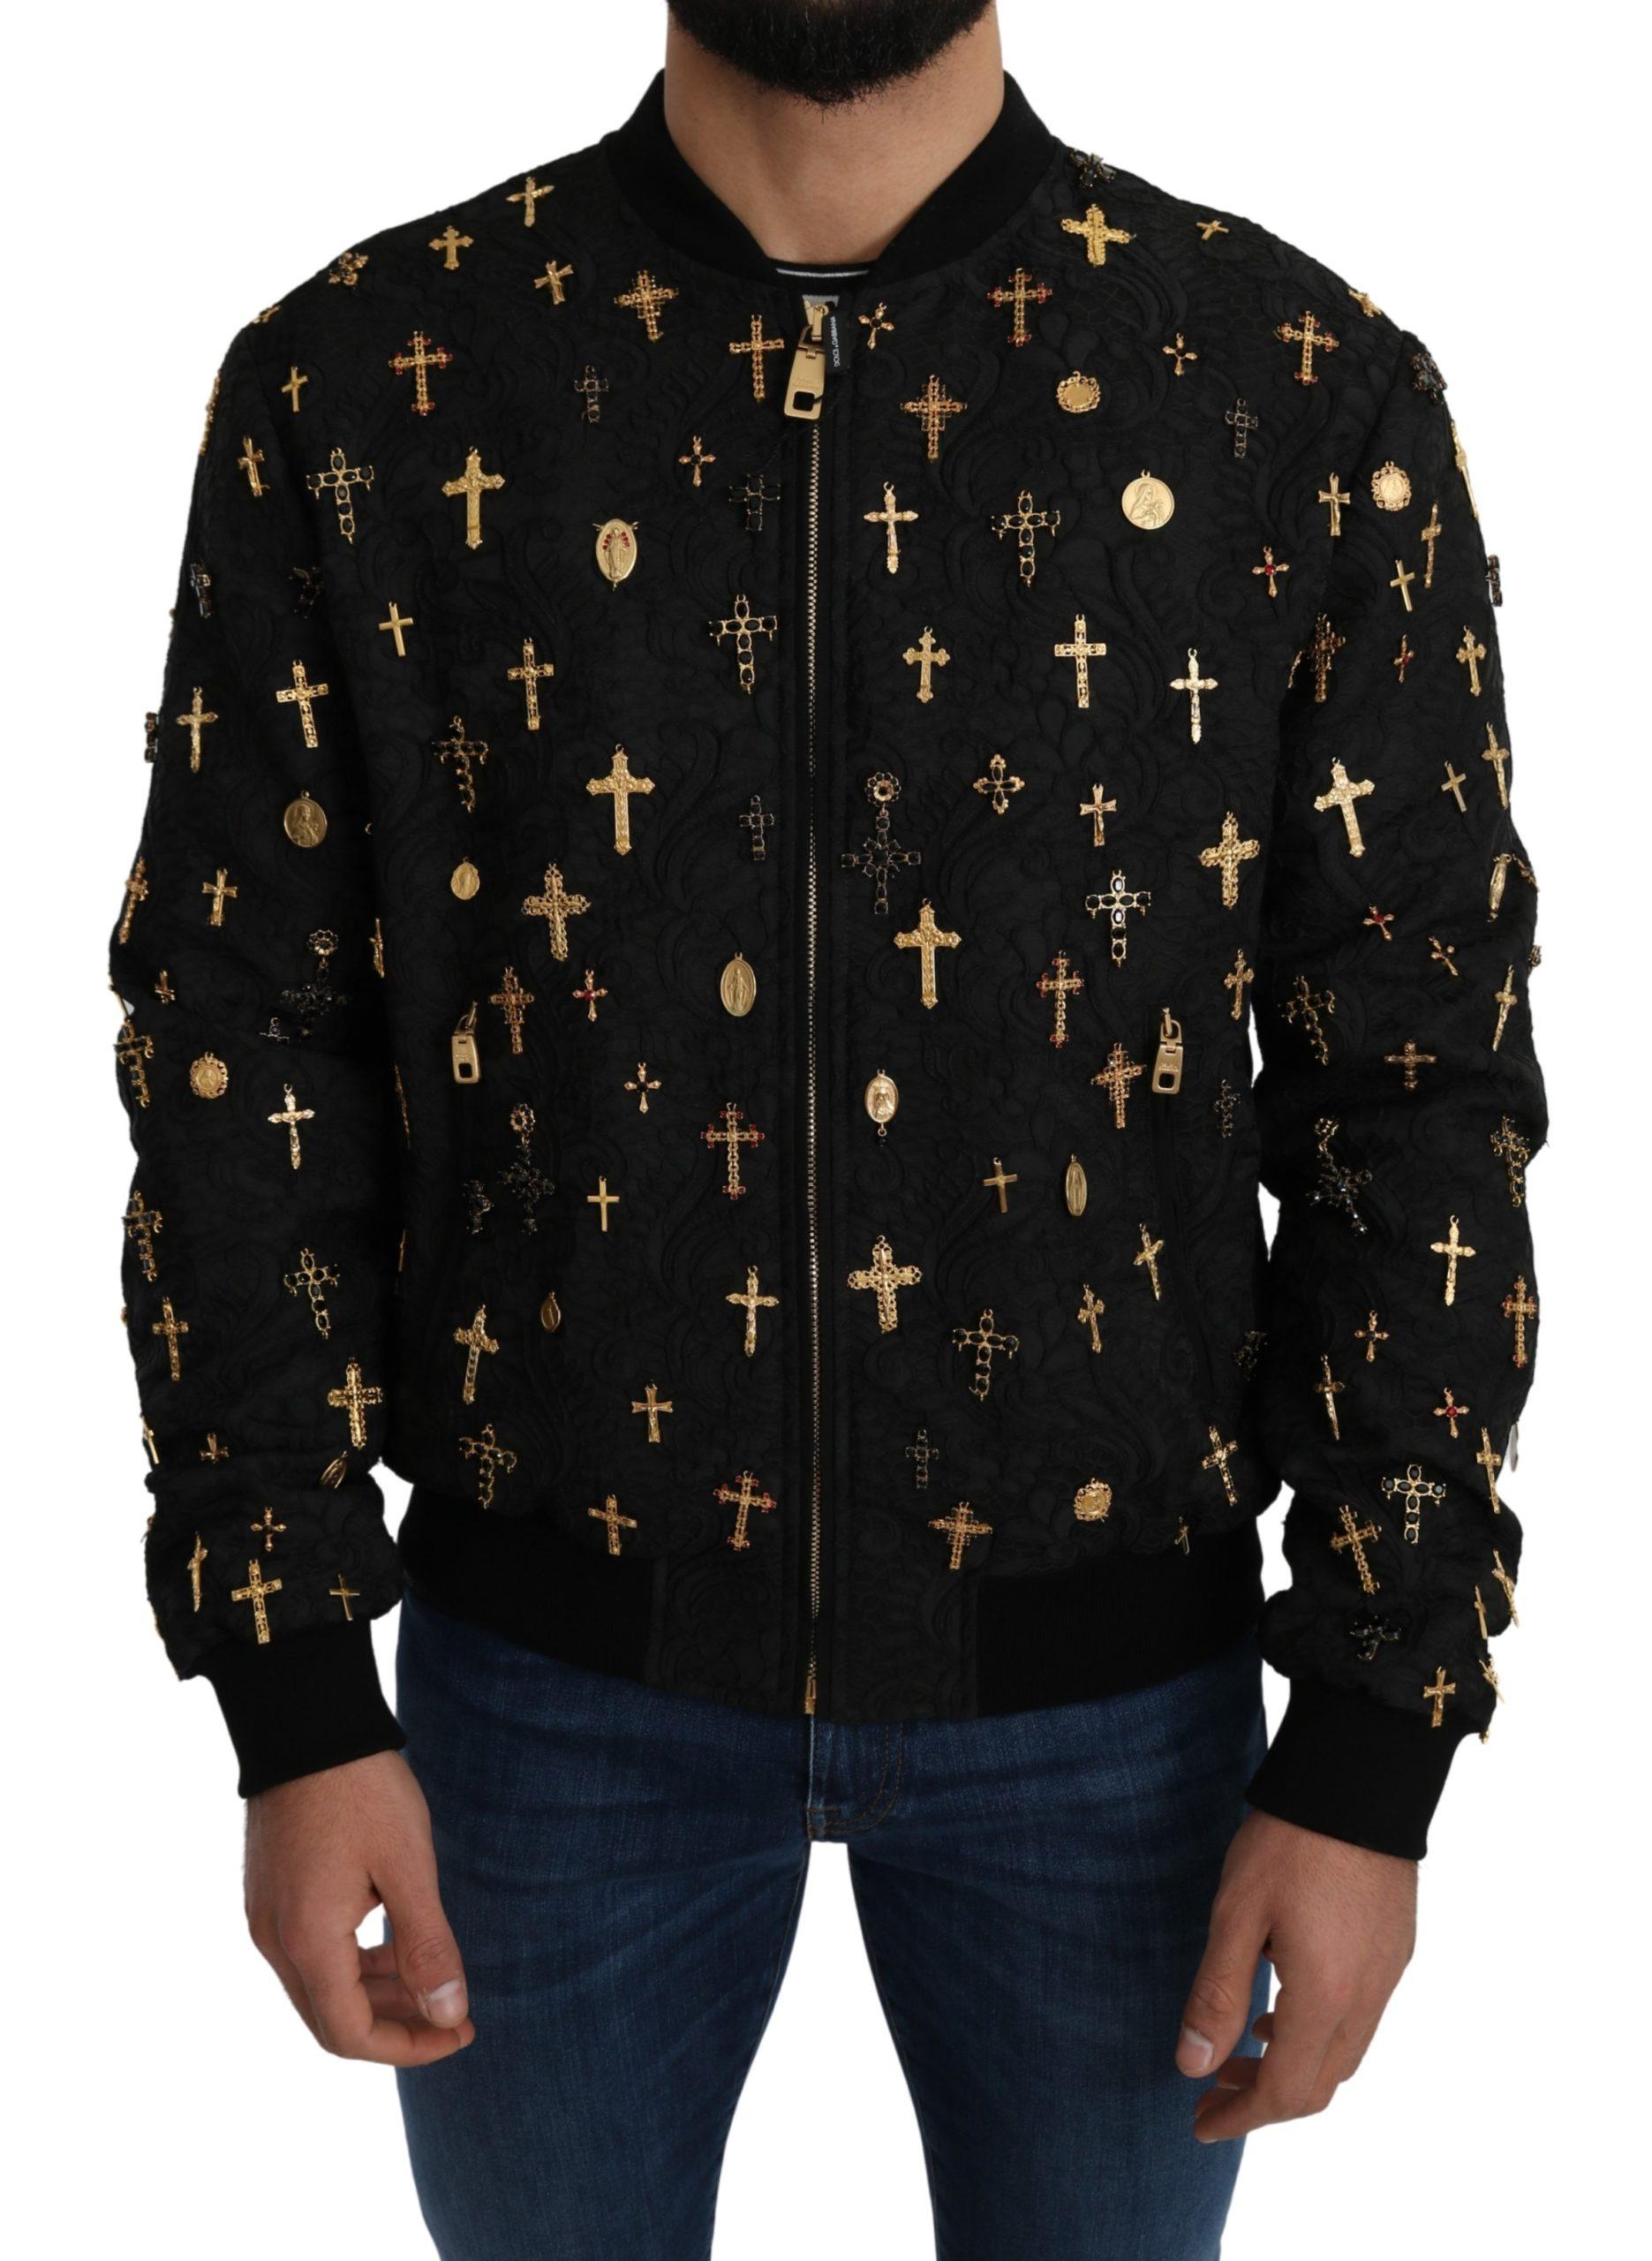 Dolce & Gabbana Men's Jacquard Cross Charms Bomber Jacket Black JKT2661 - IT54 | XL